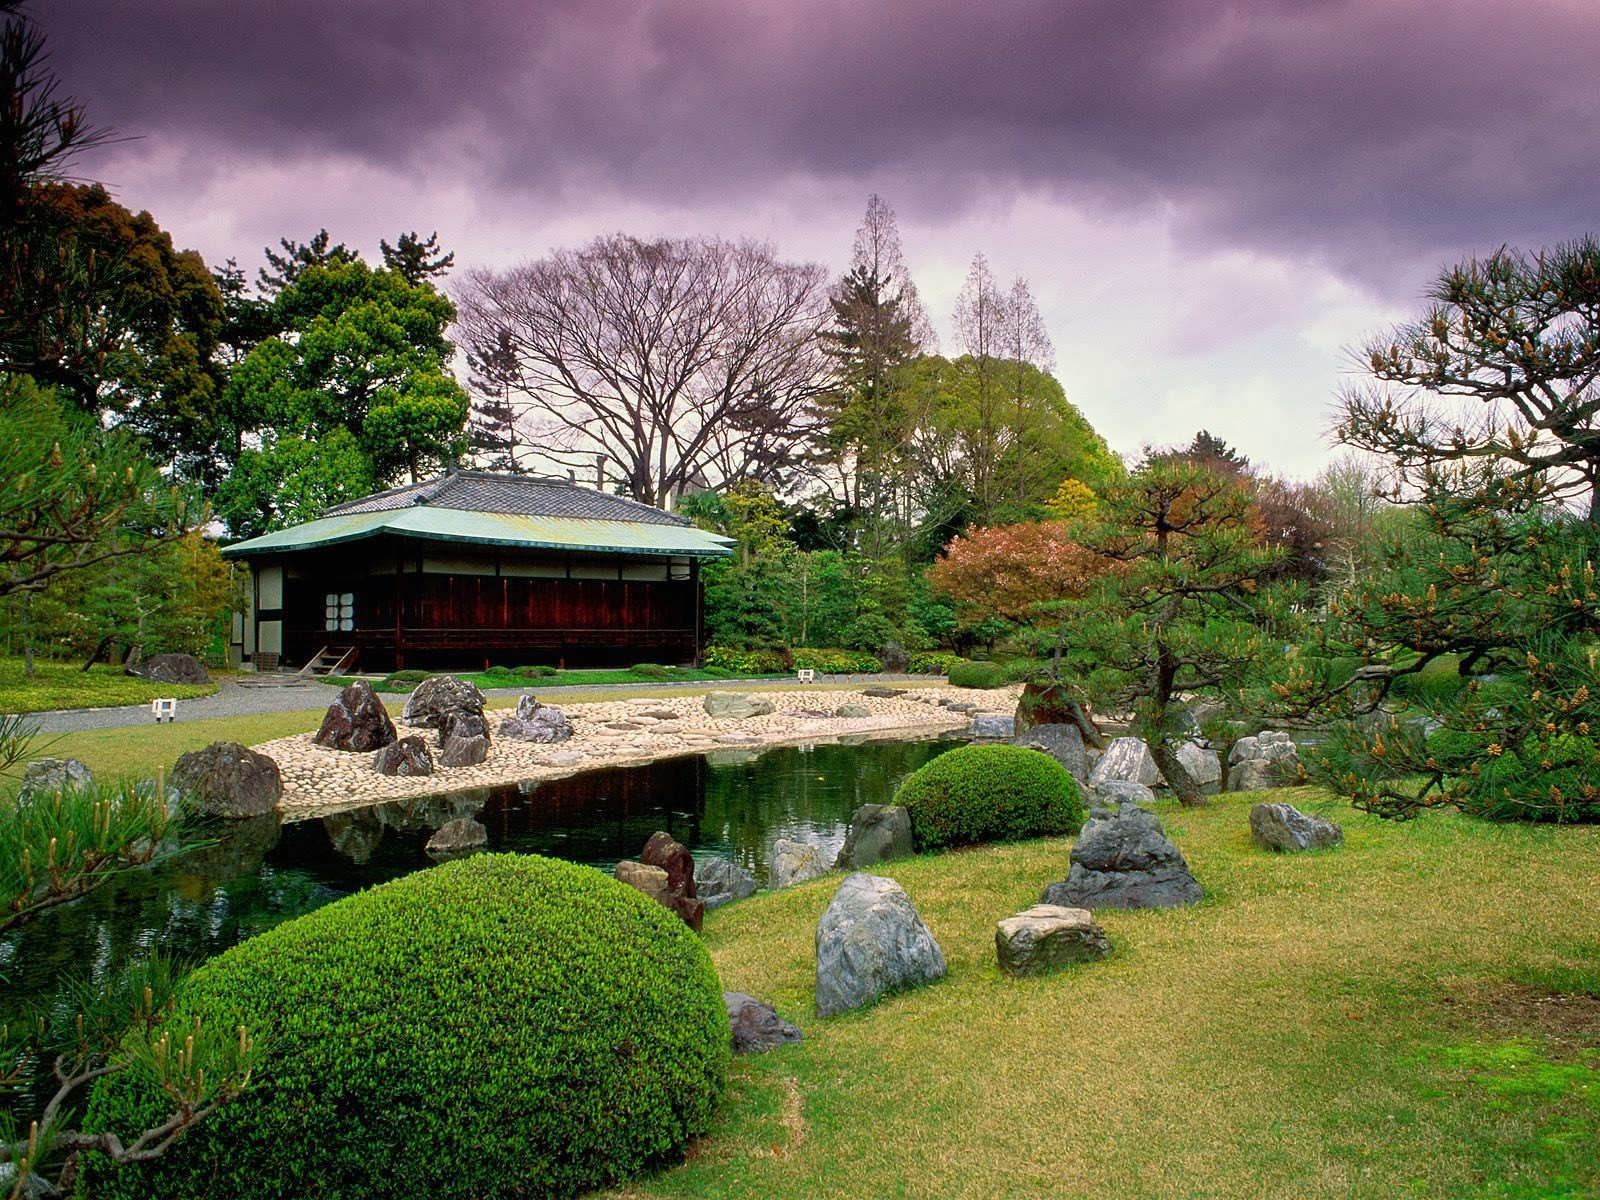 Garden Wallpapers - Full HD wallpaper   Pic Gallery